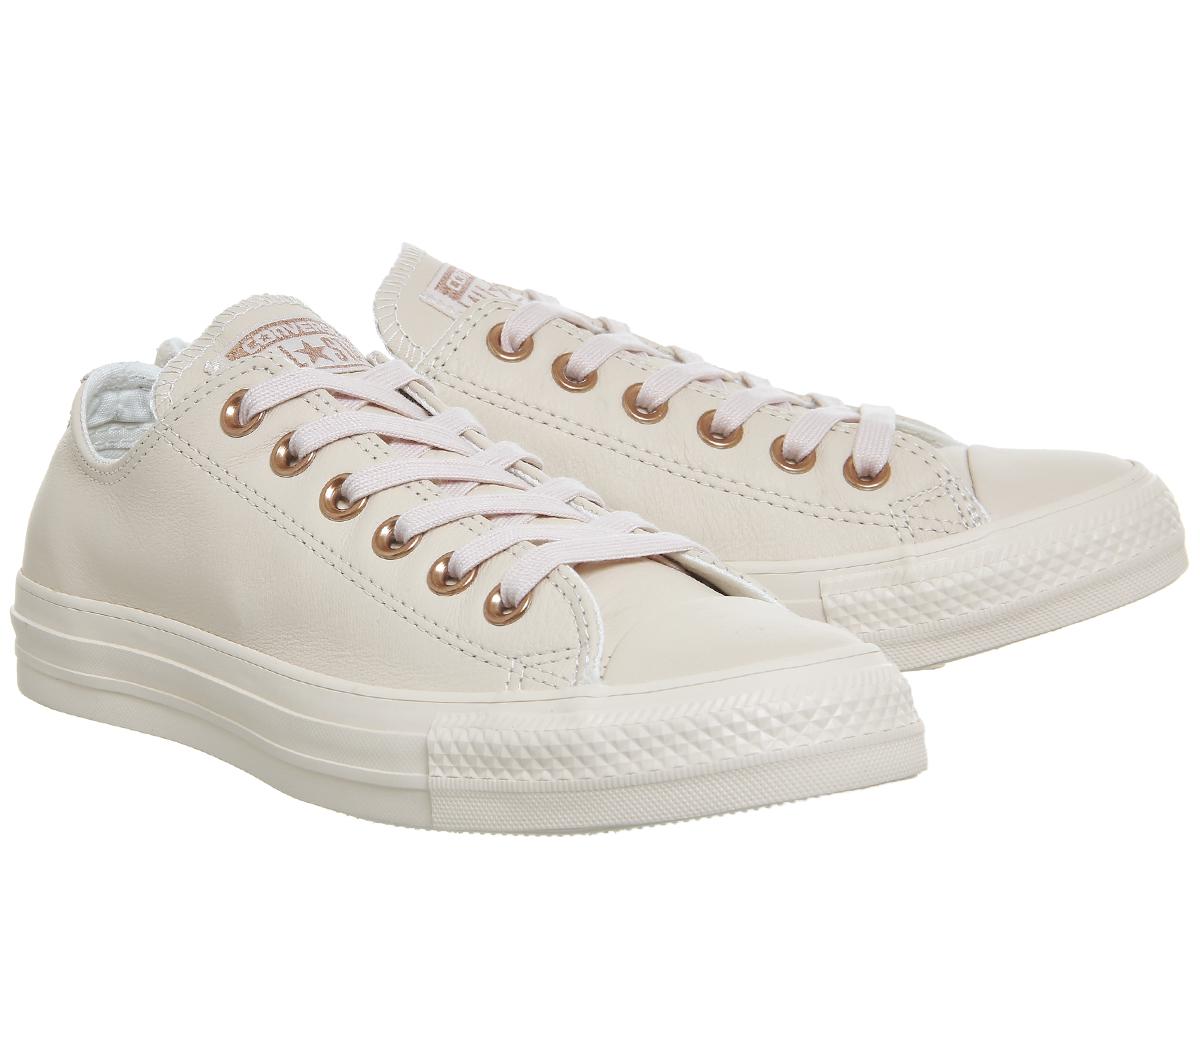 Damenschuhe Converse All Star Niedrig Leder PASTEL TAN ROSE TAN PASTEL ROSE GOLD Trainers Schuhes 295350